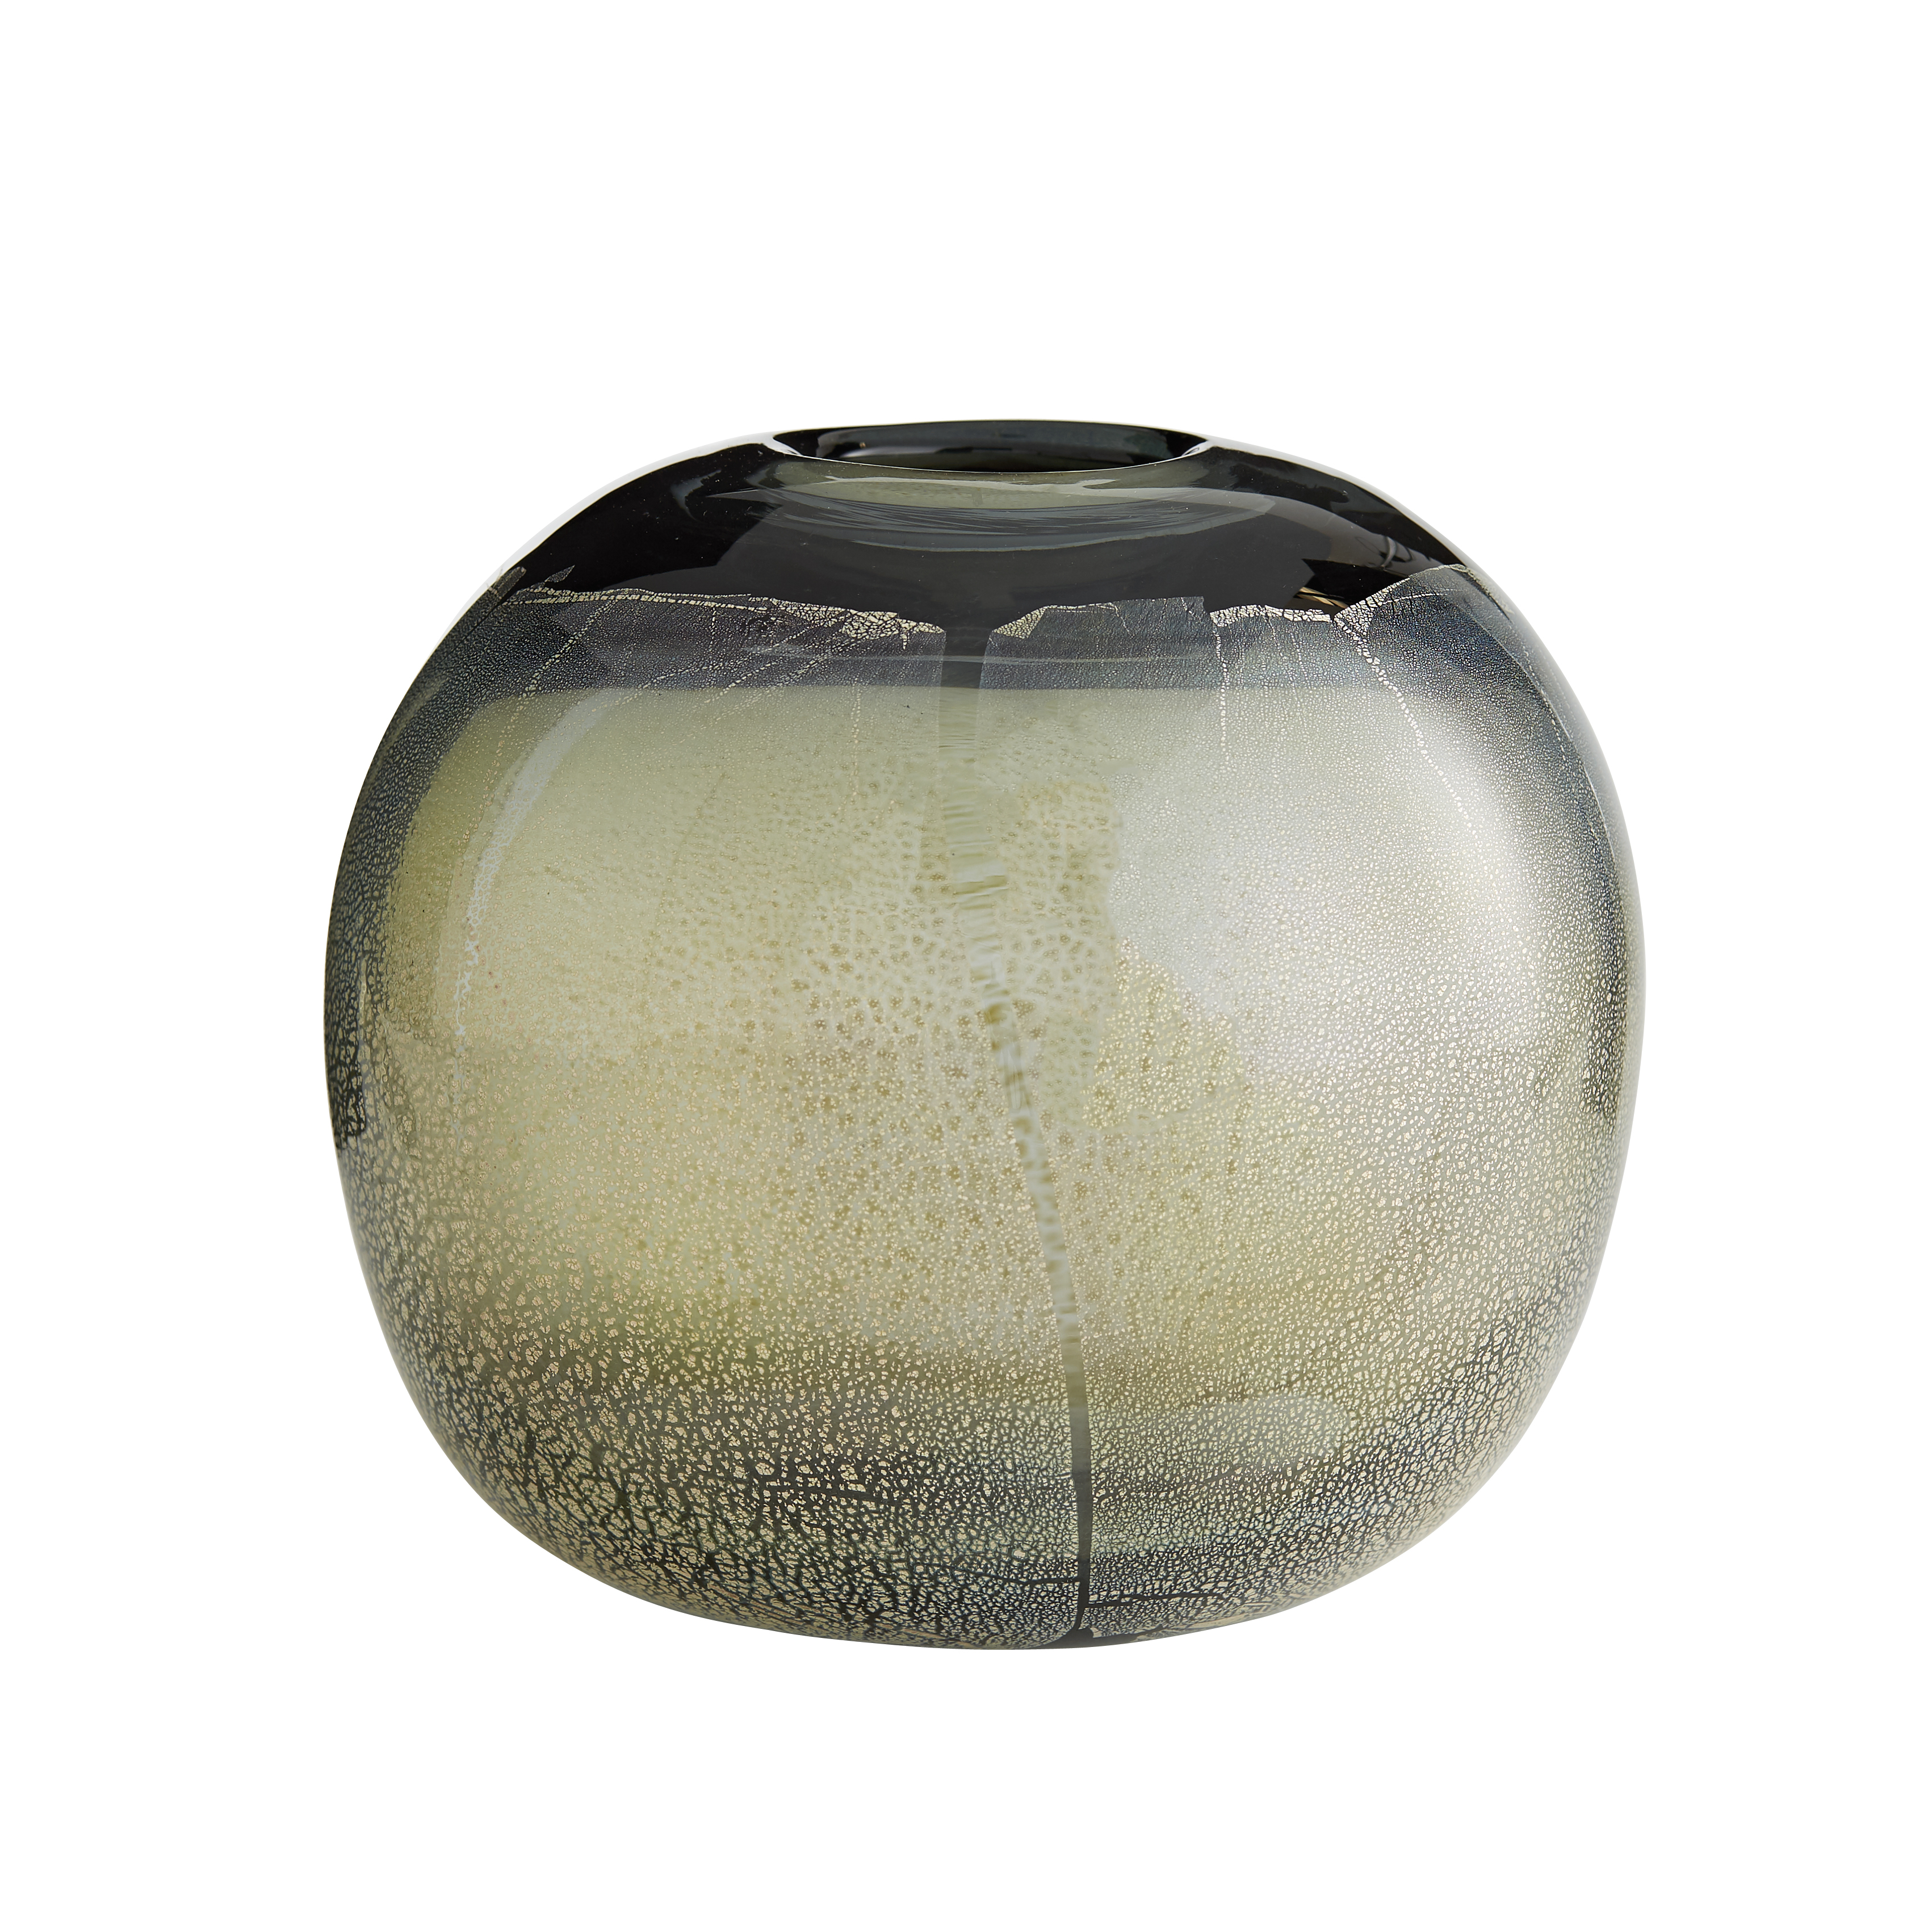 Arteriors Marek round vase